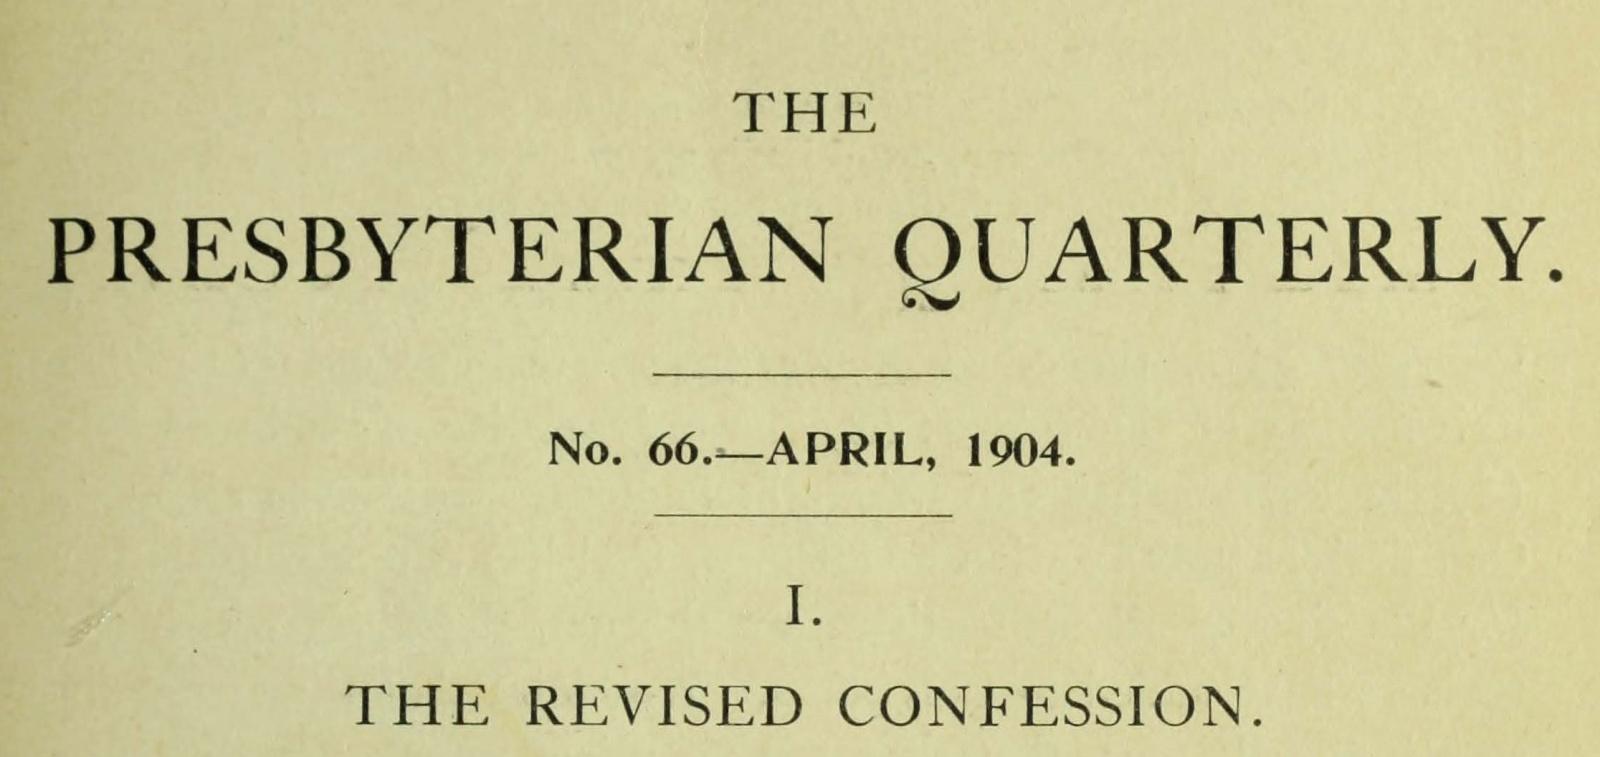 Webb, Robert Alexander, The Revised Confession Title Page.jpg